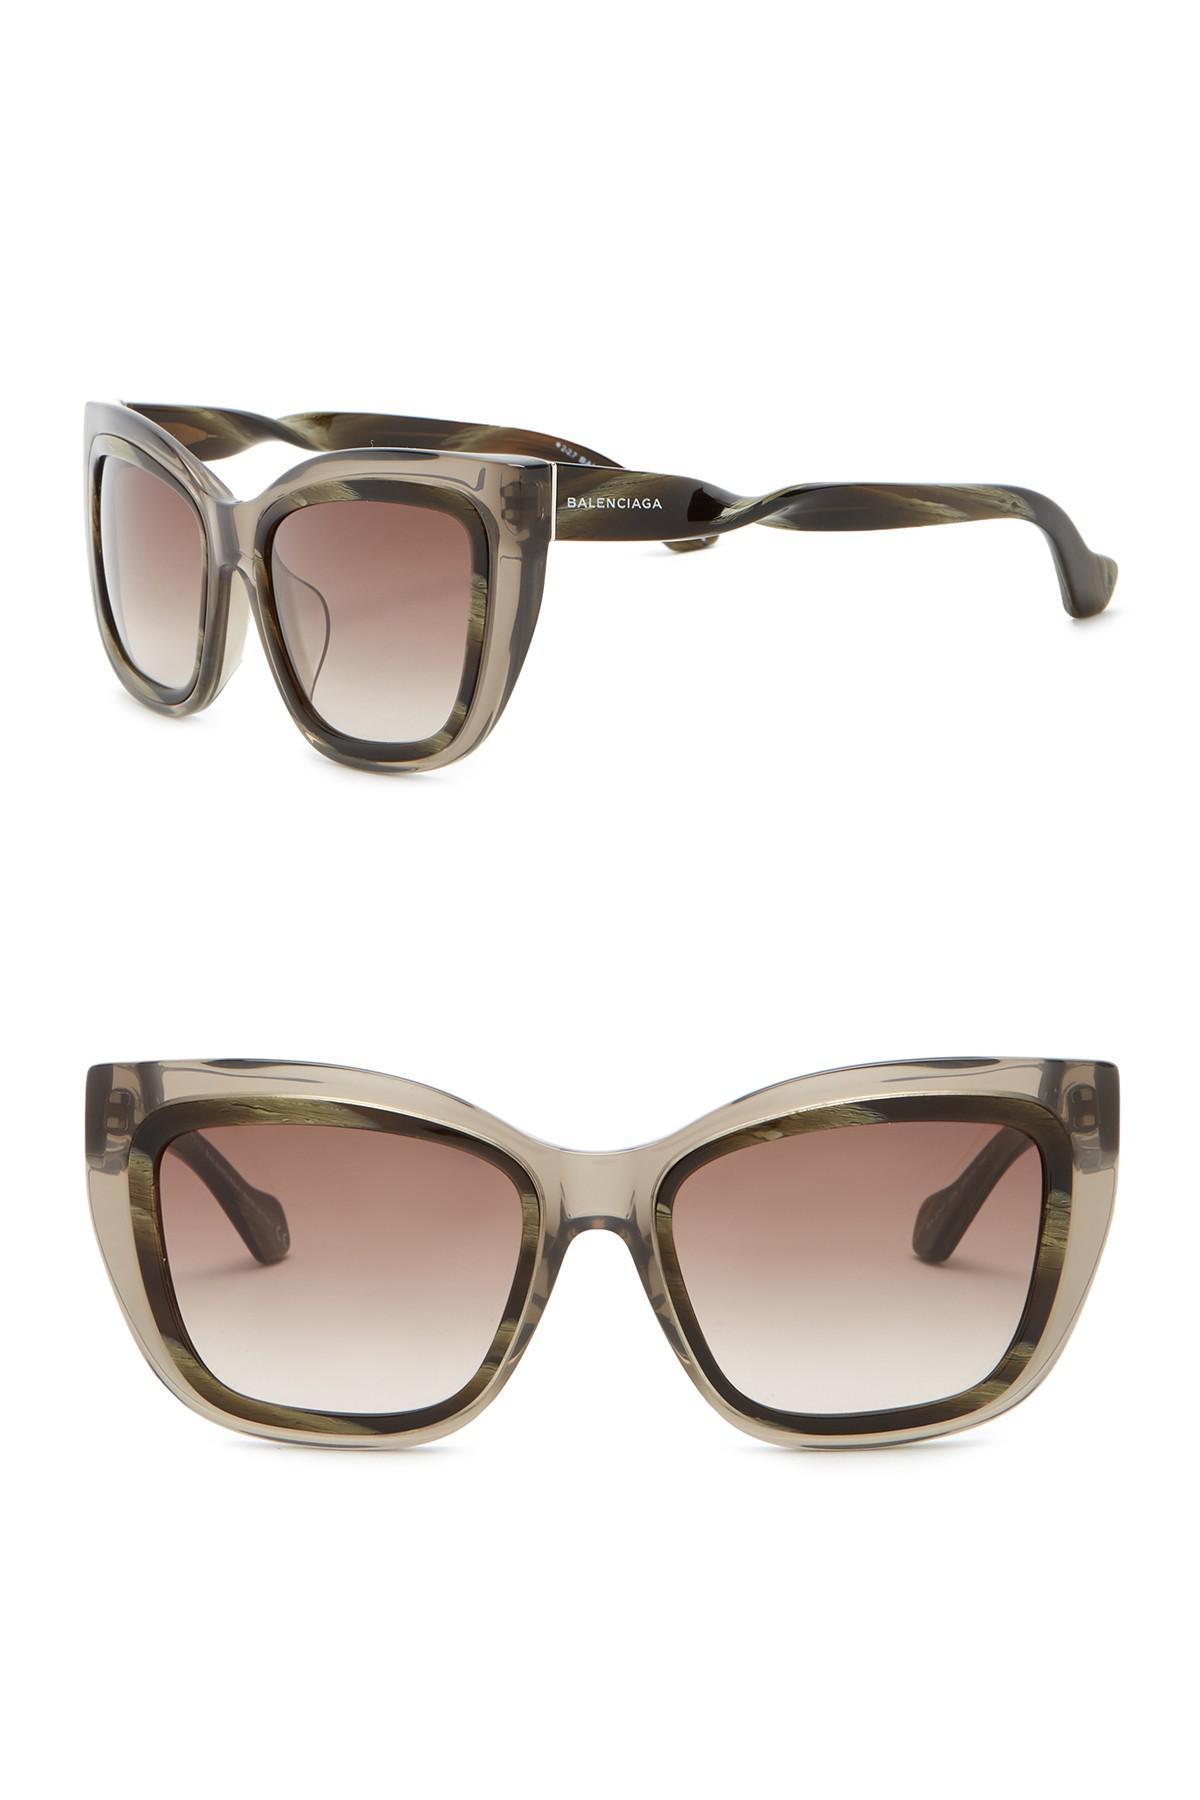 67f6c0f138 Lyst - Balenciaga 55mm Squared Cat Eye Sunglasses in Brown